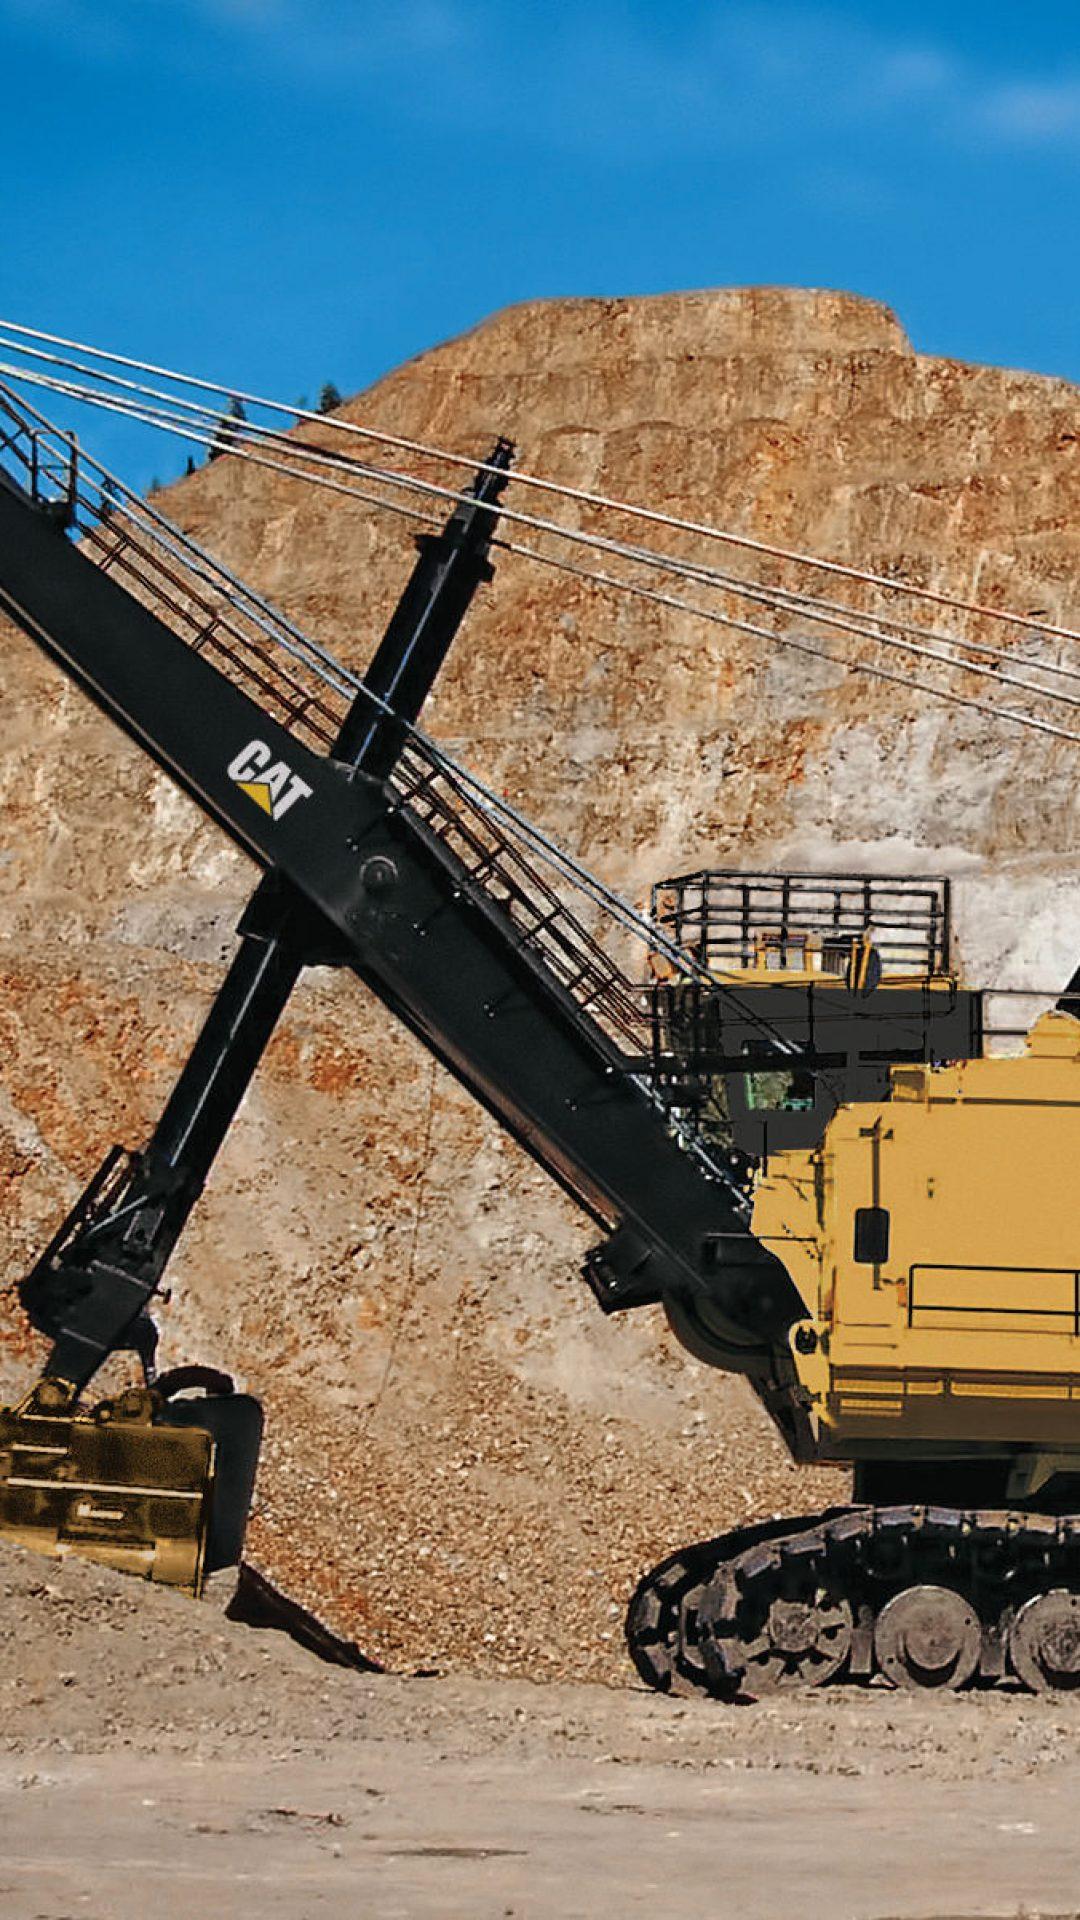 electric-mining-shovels-55229-2904419